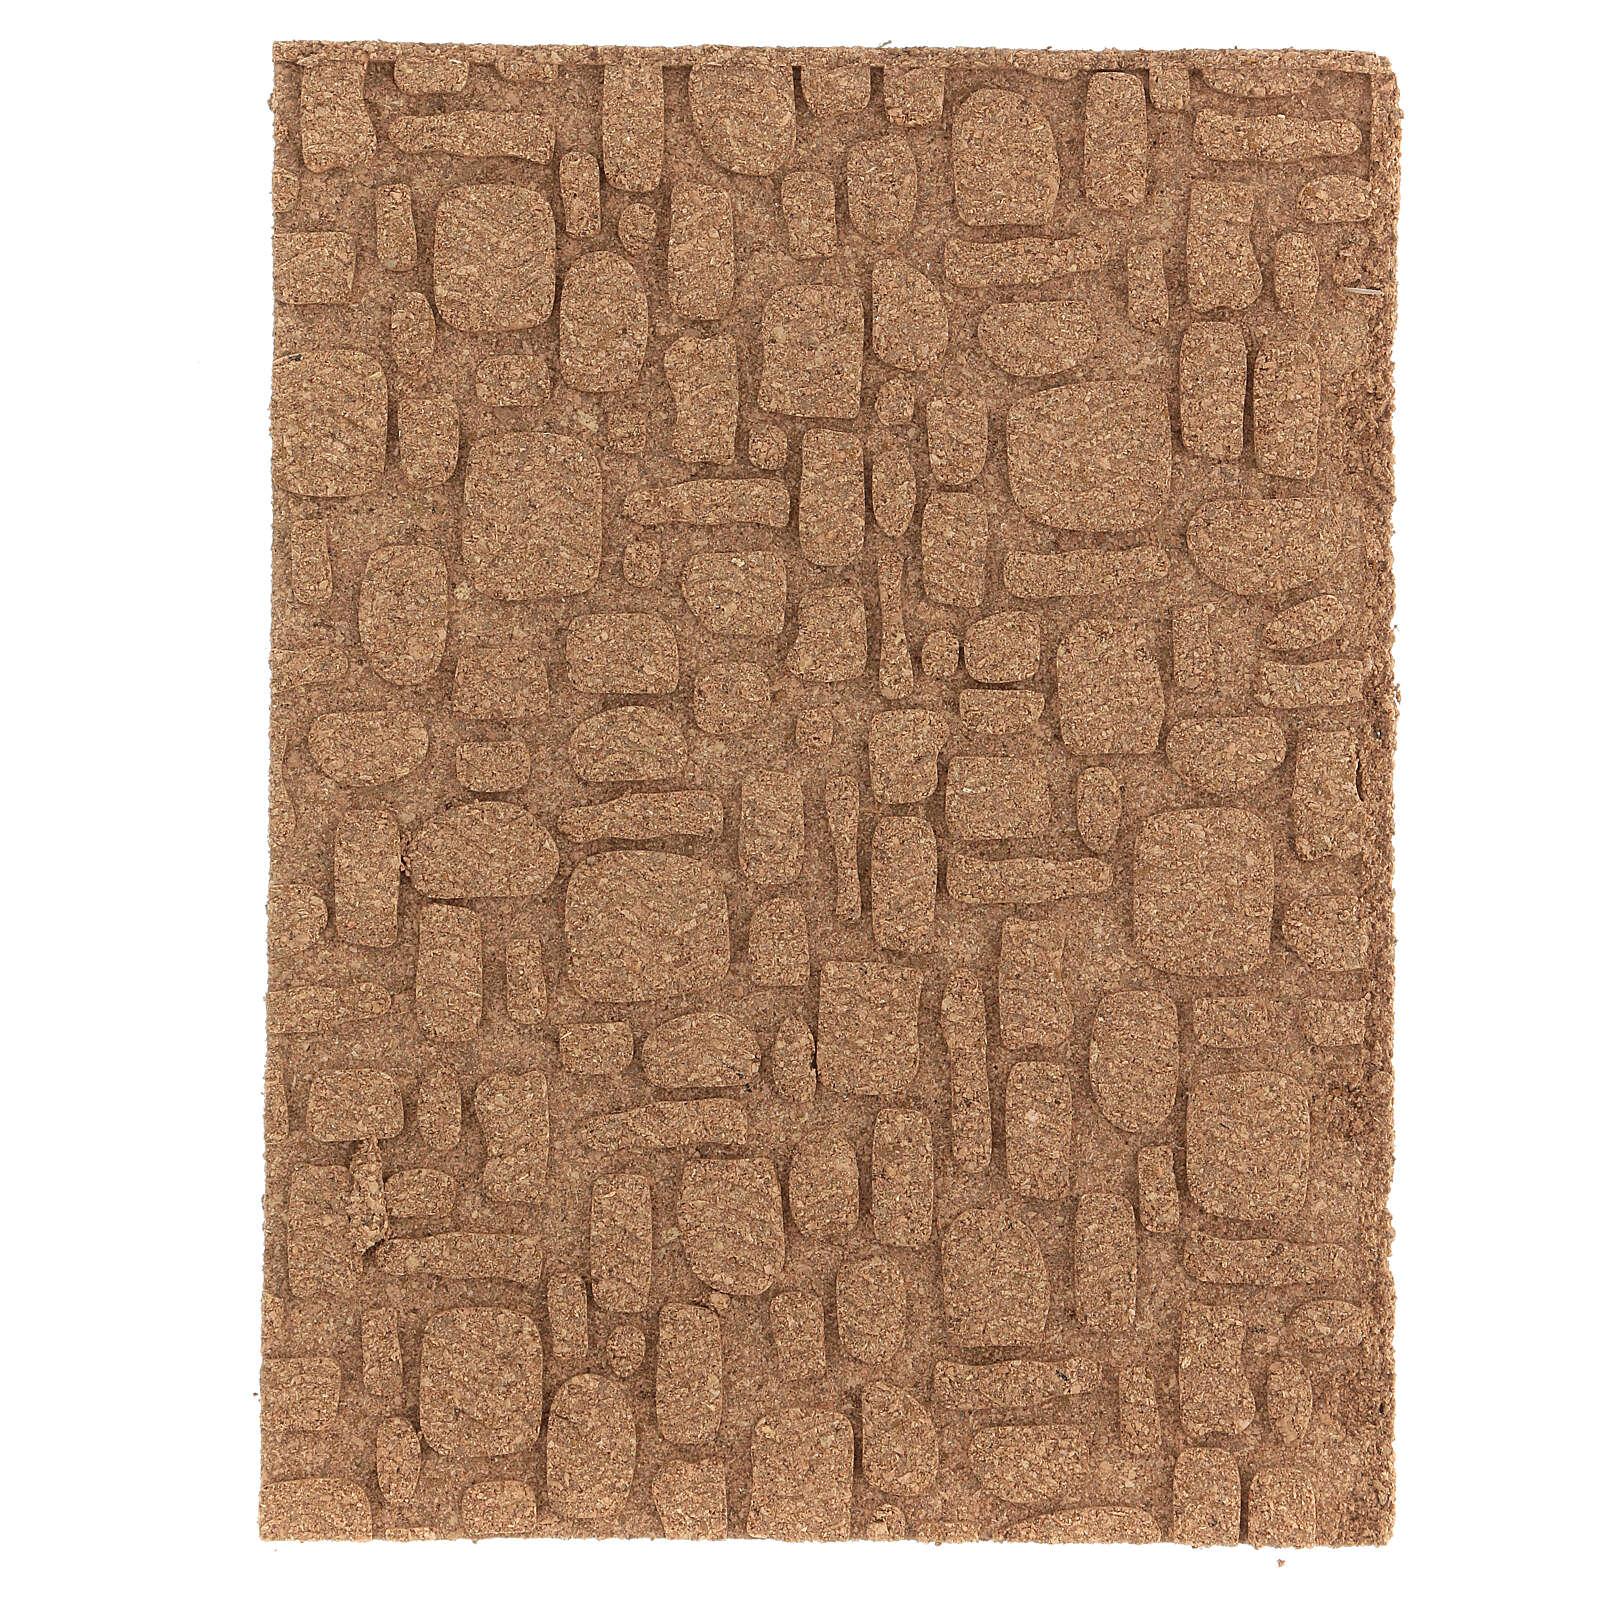 Panel cork wall floor DIY mosaic 35x25 cm 4